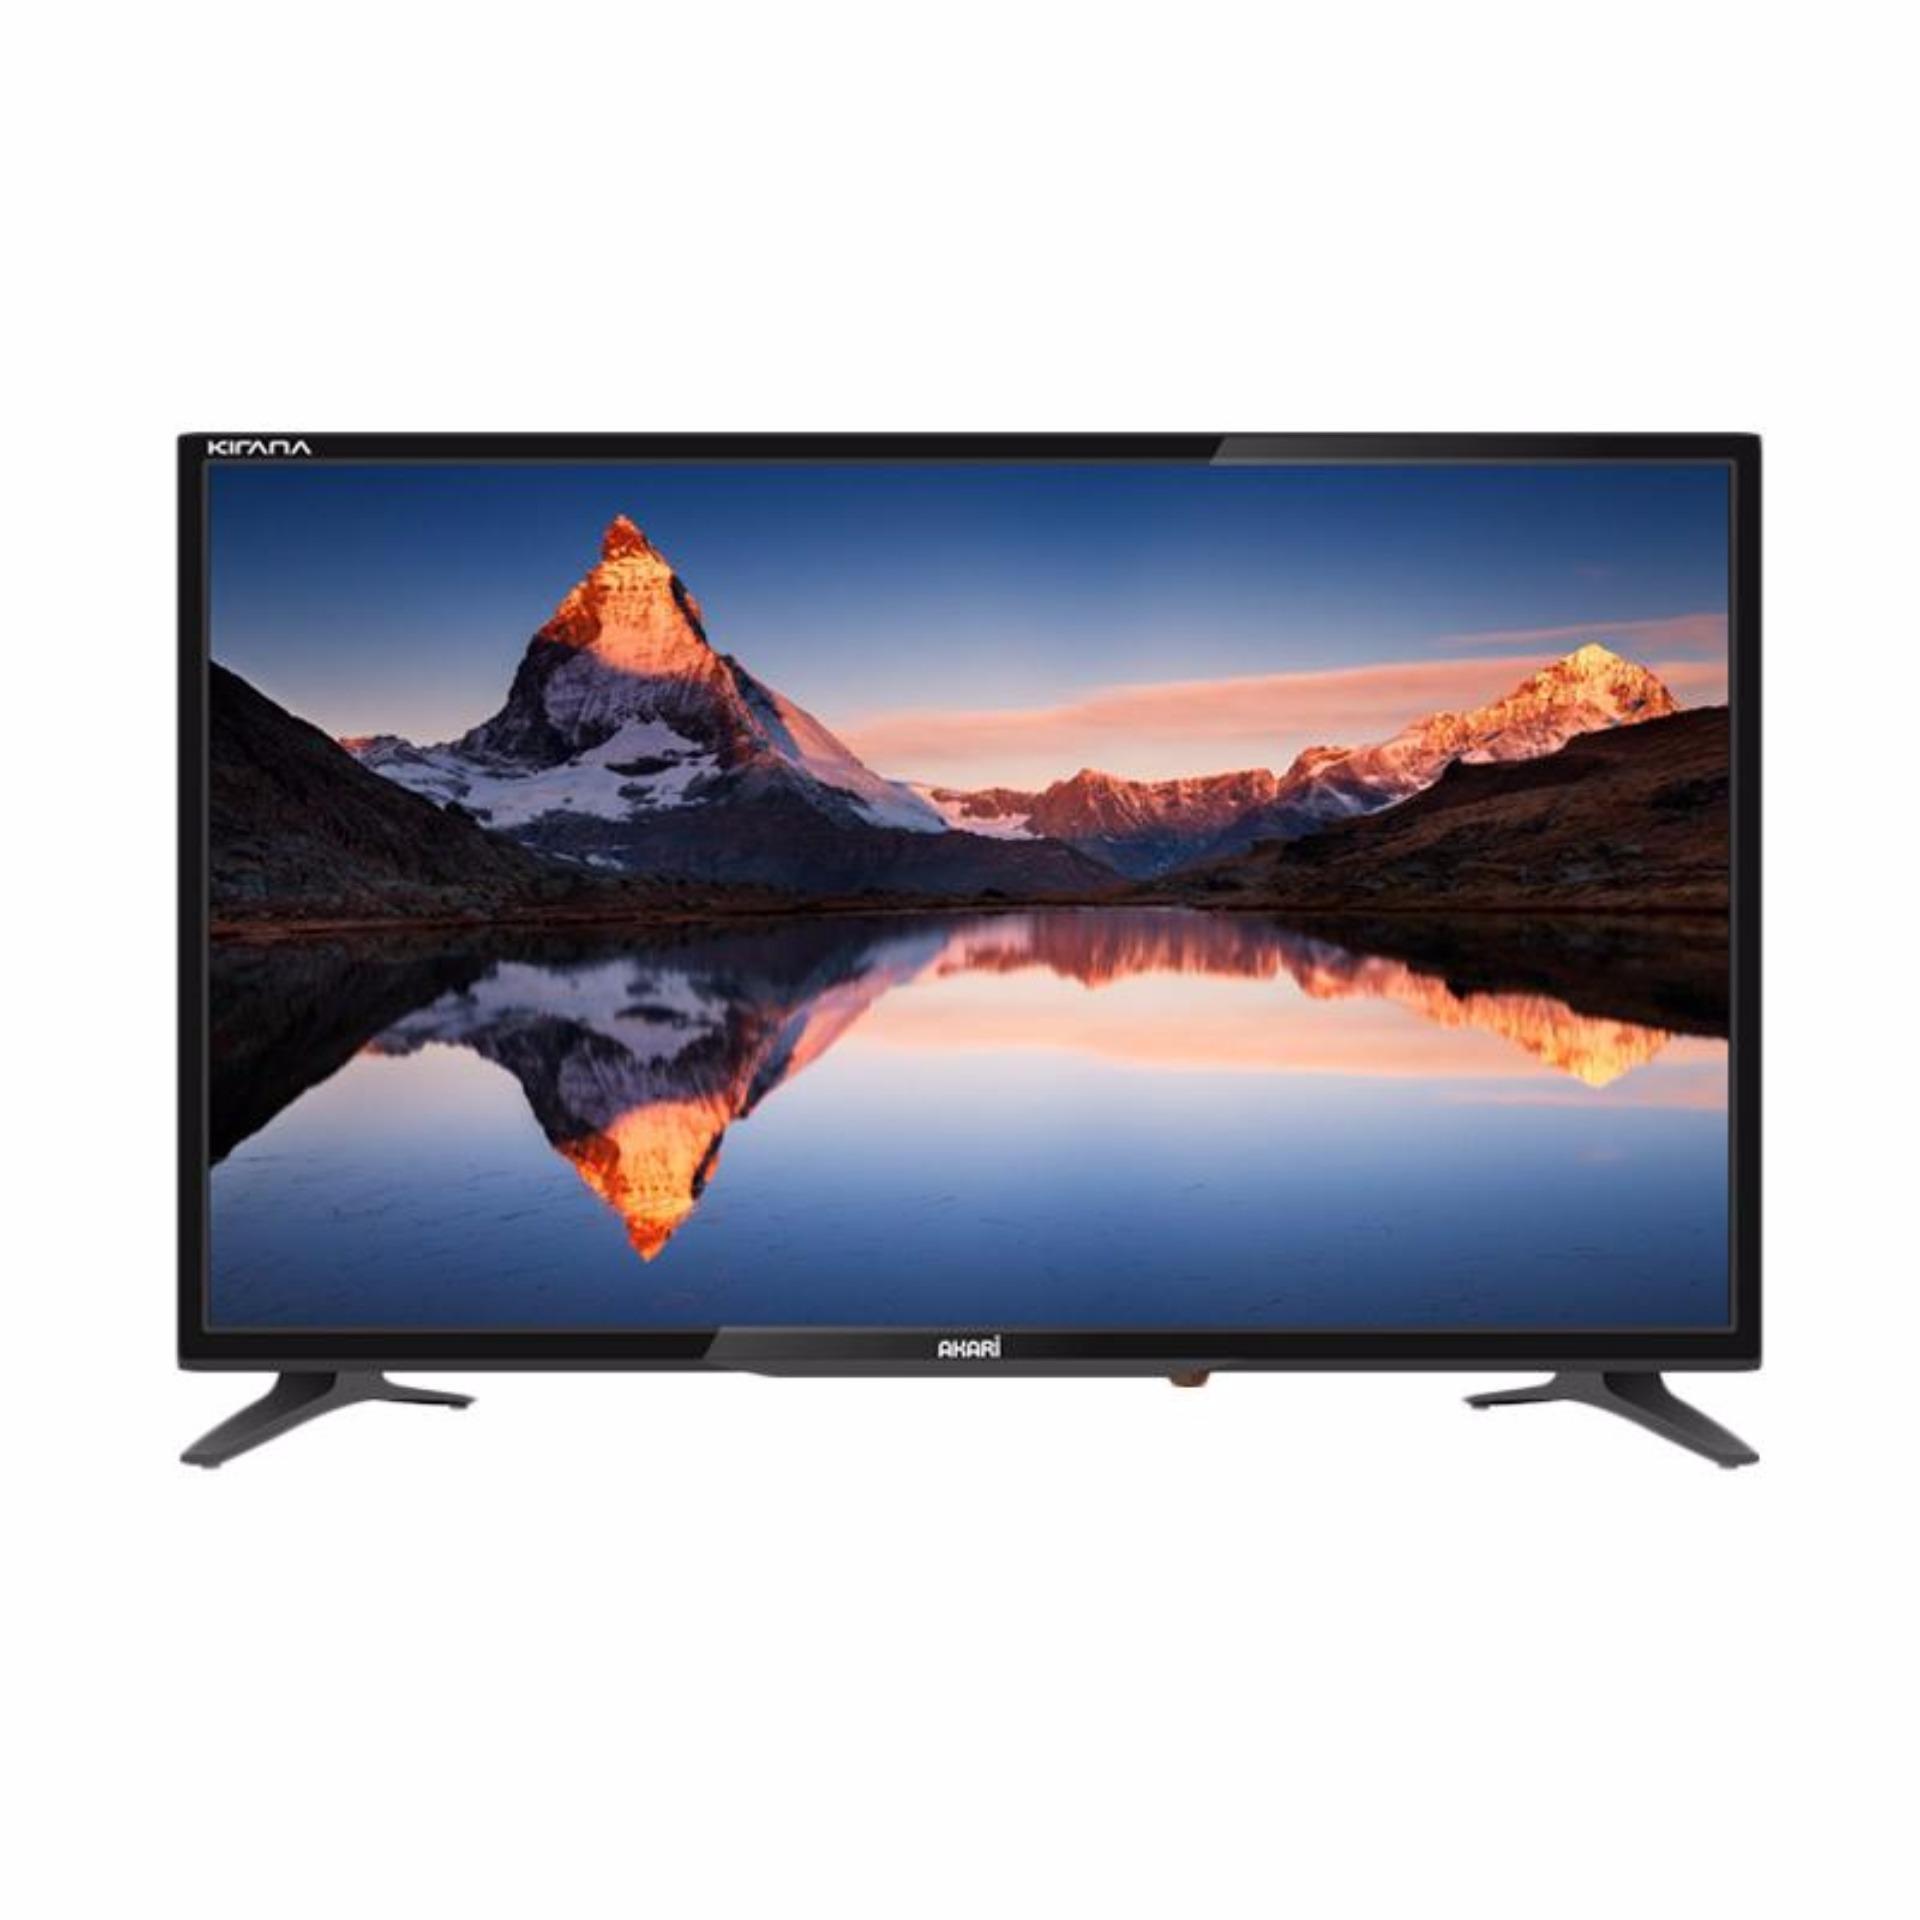 Samsung 43 Led Tv Ua43j5100 Hitam7 Daftar Harga Terkini Ua40j5100 Full Hd 40ampquot Hitam Khusus Jadetabek 32 Inch Flat Digital 32k5100 Source